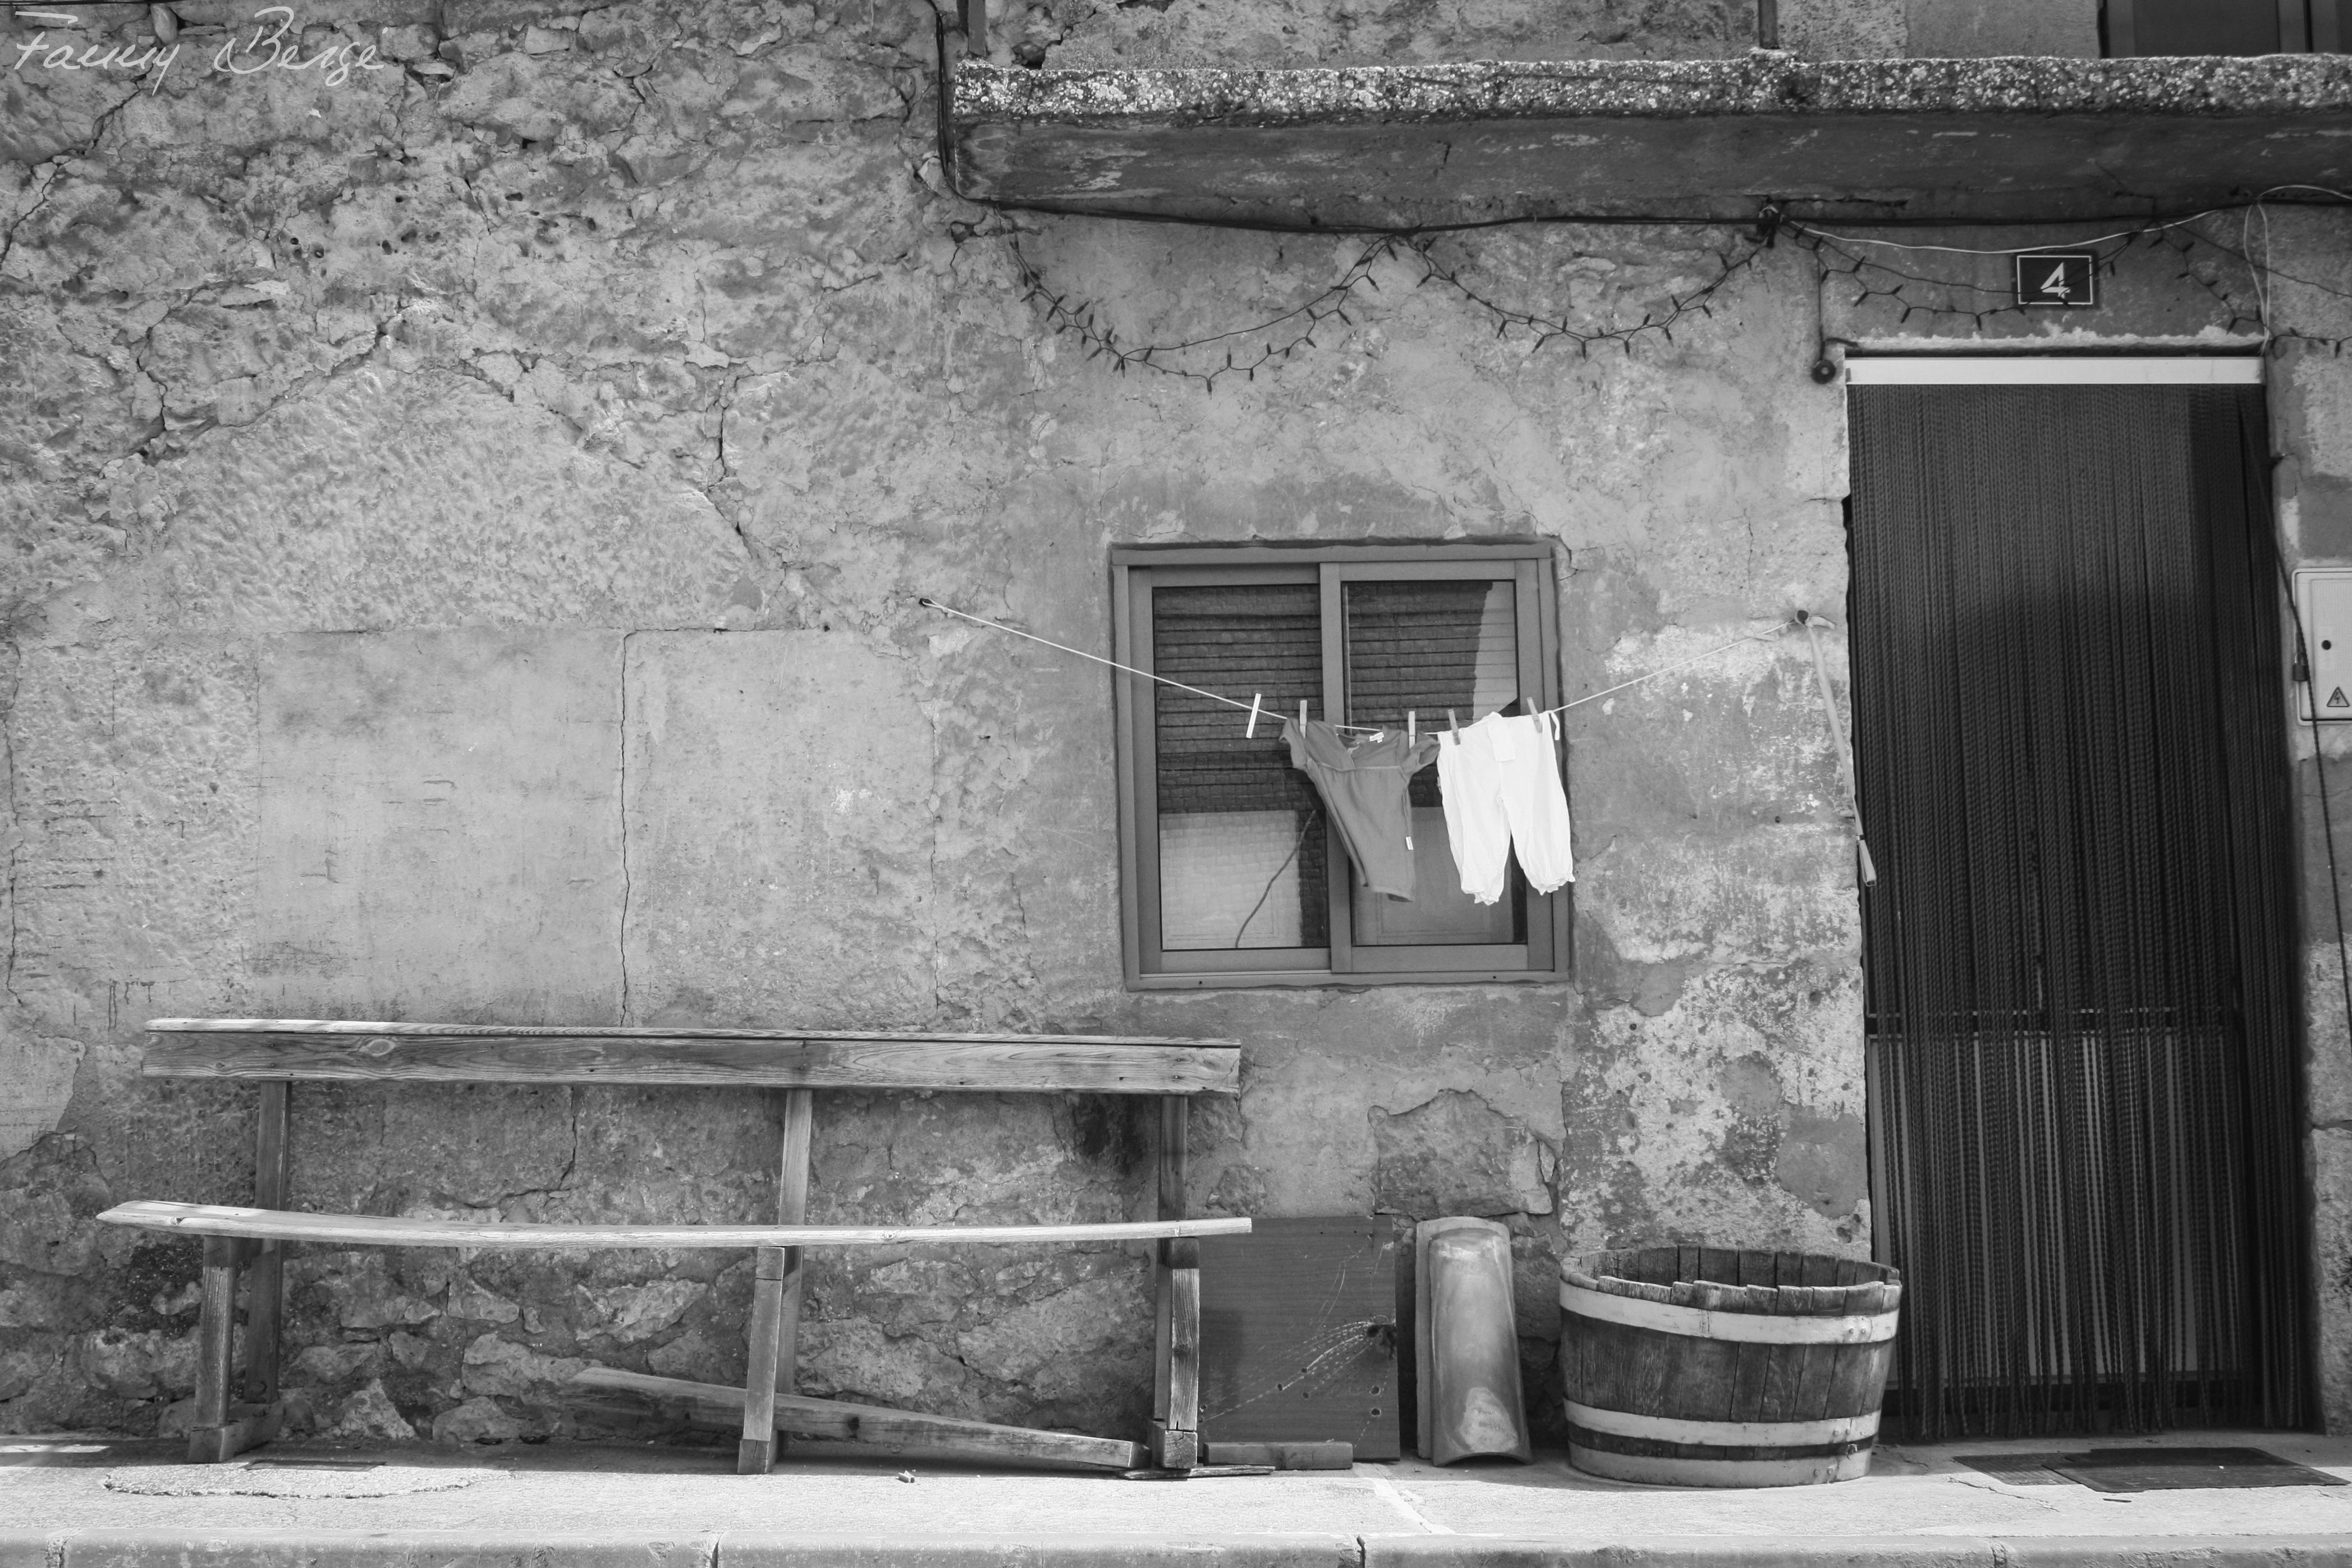 Ontoria, Spain